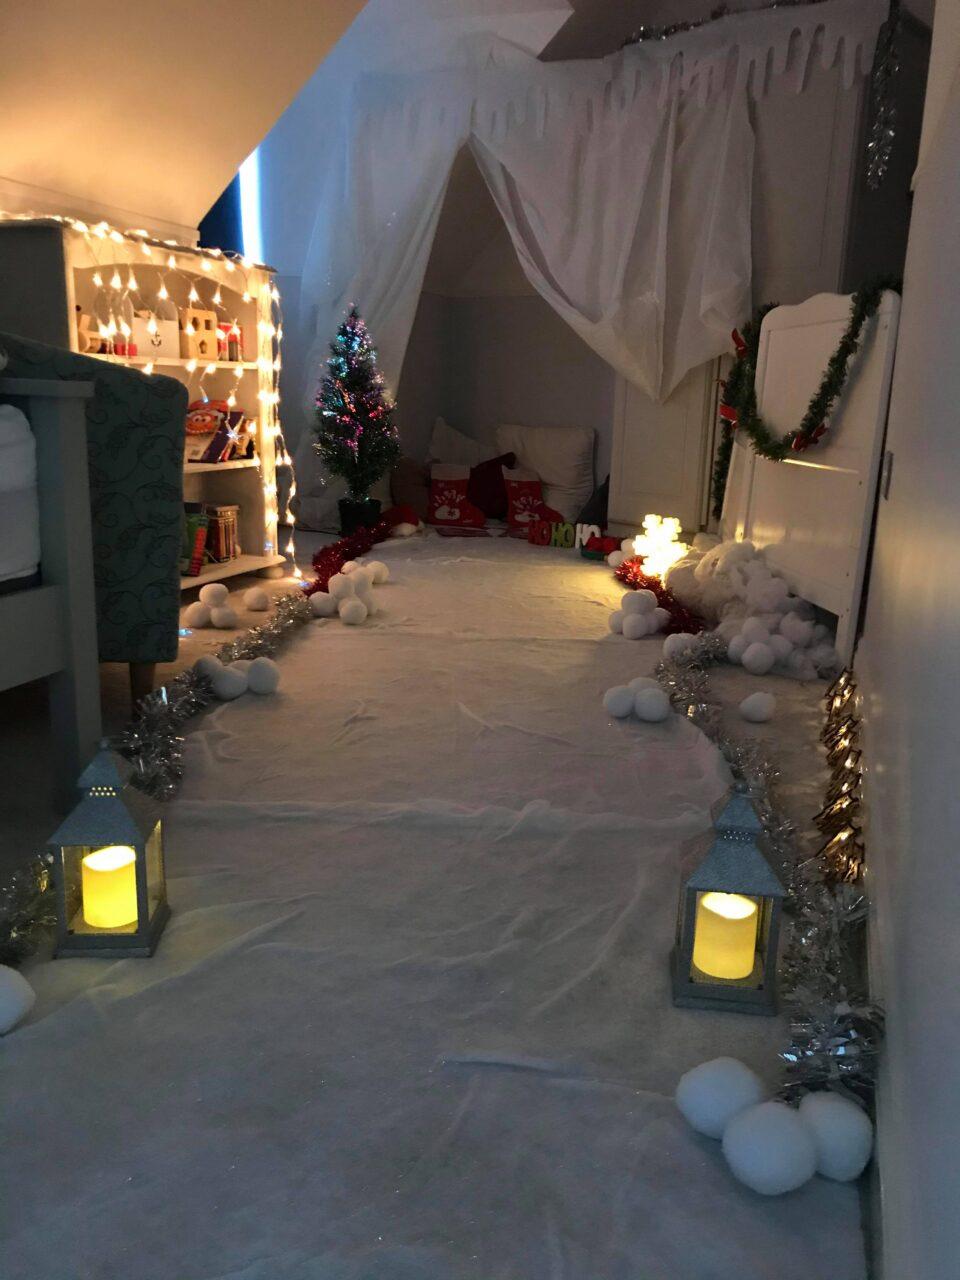 the bedroom transformed into a winter wonderland